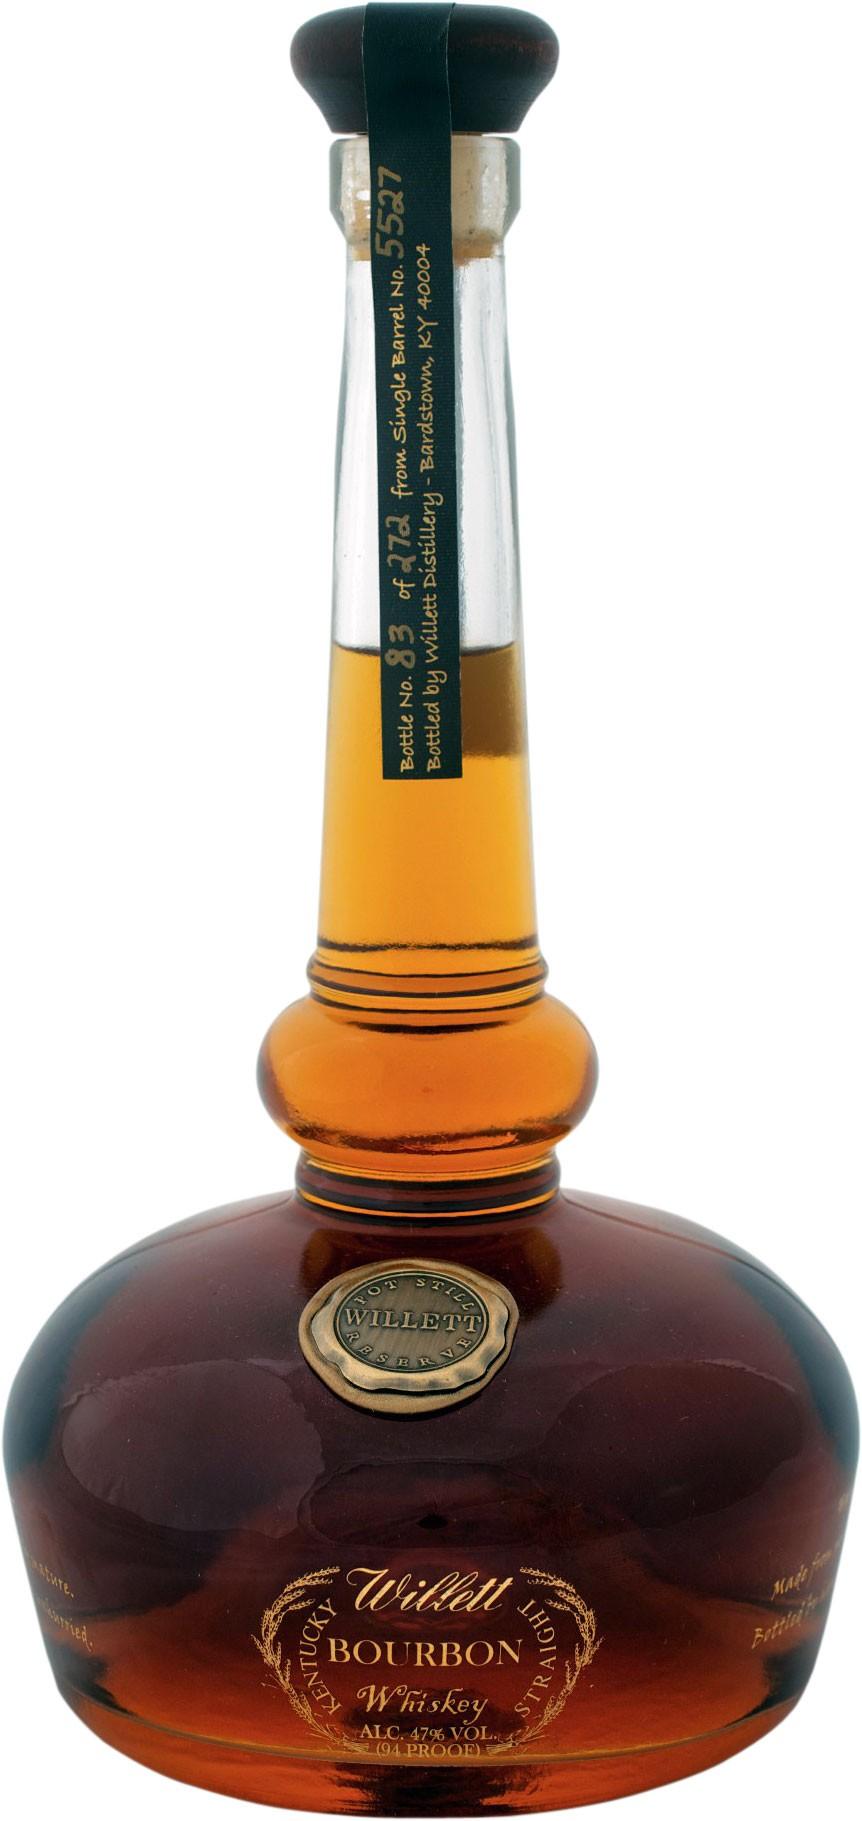 WILLETT Reserve Bourbon Whiskey Pot Still 47% 0,7 l